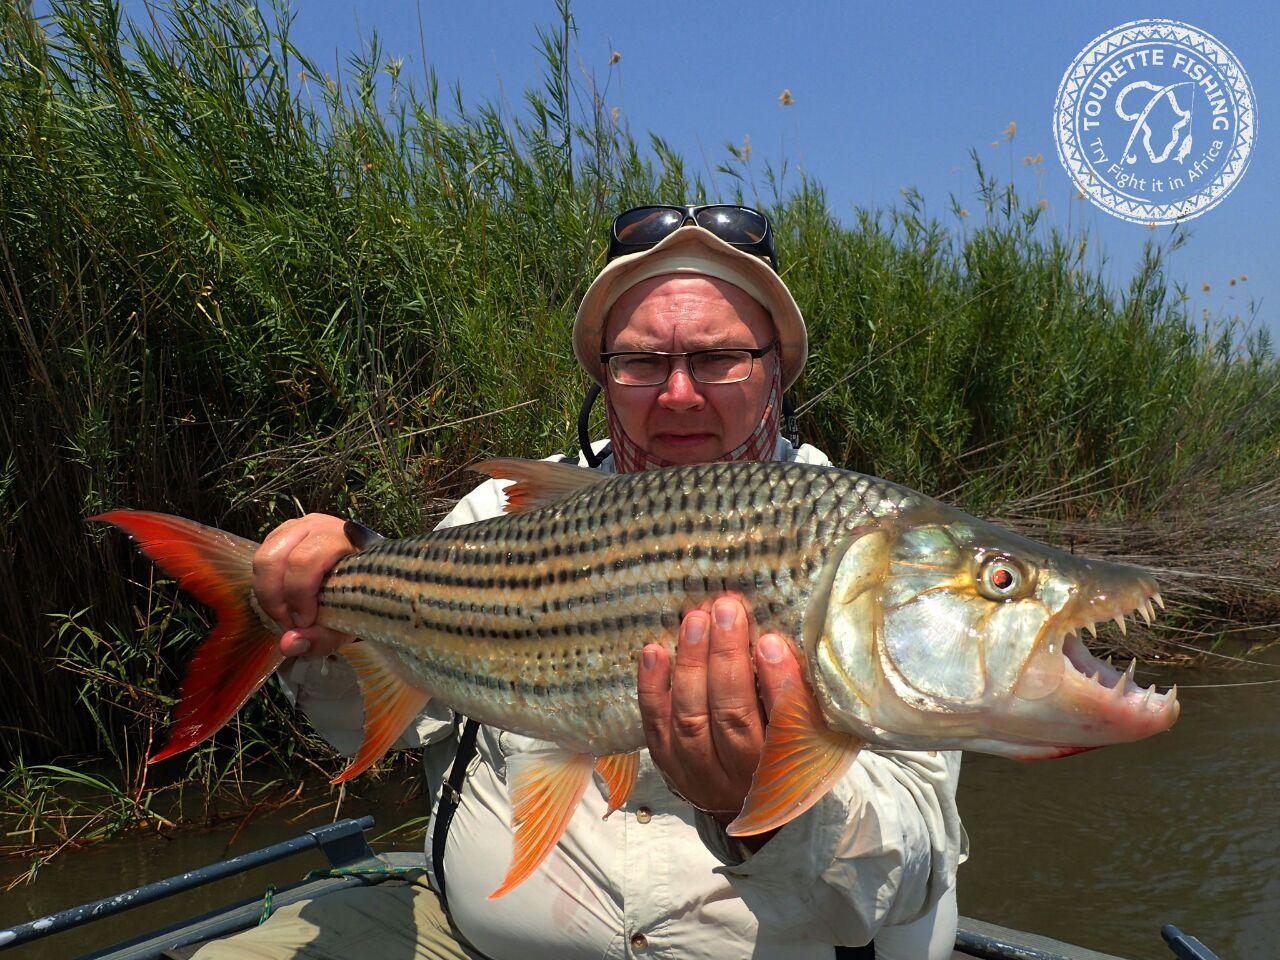 okavango-barbel-run-tigerfish-season-2016-grp-5-tourette-fishing-blog-fish